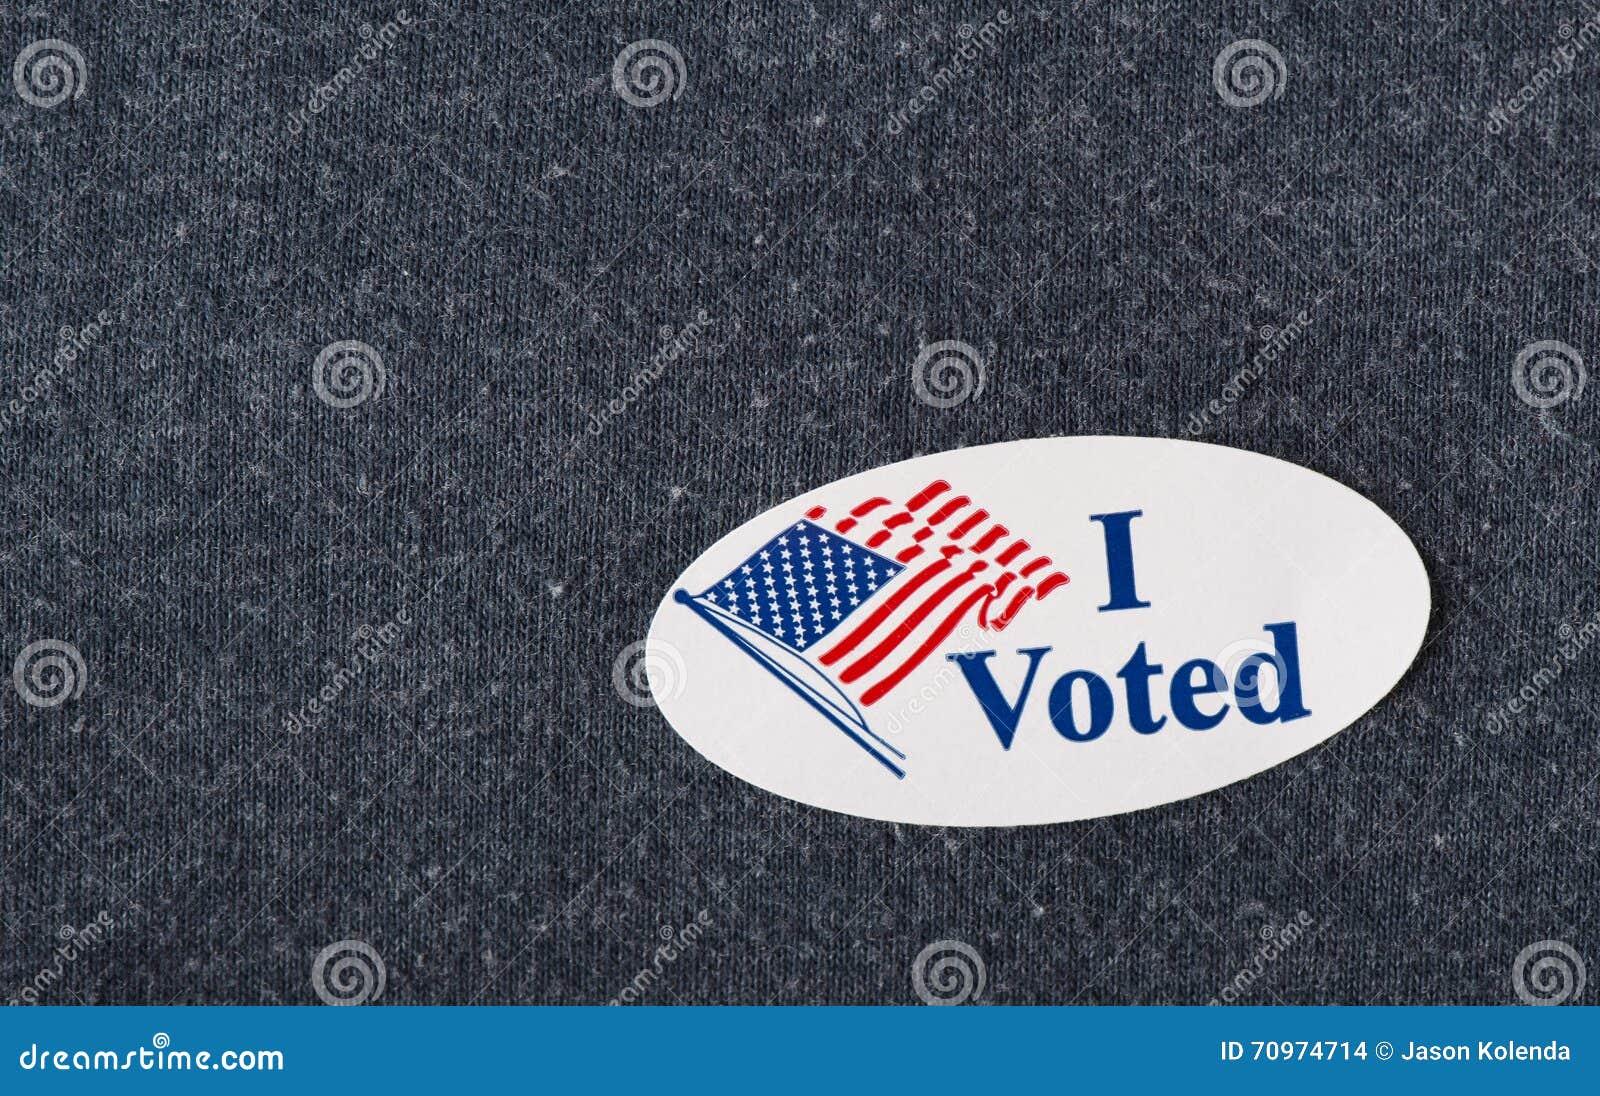 I voted sticker - closeup